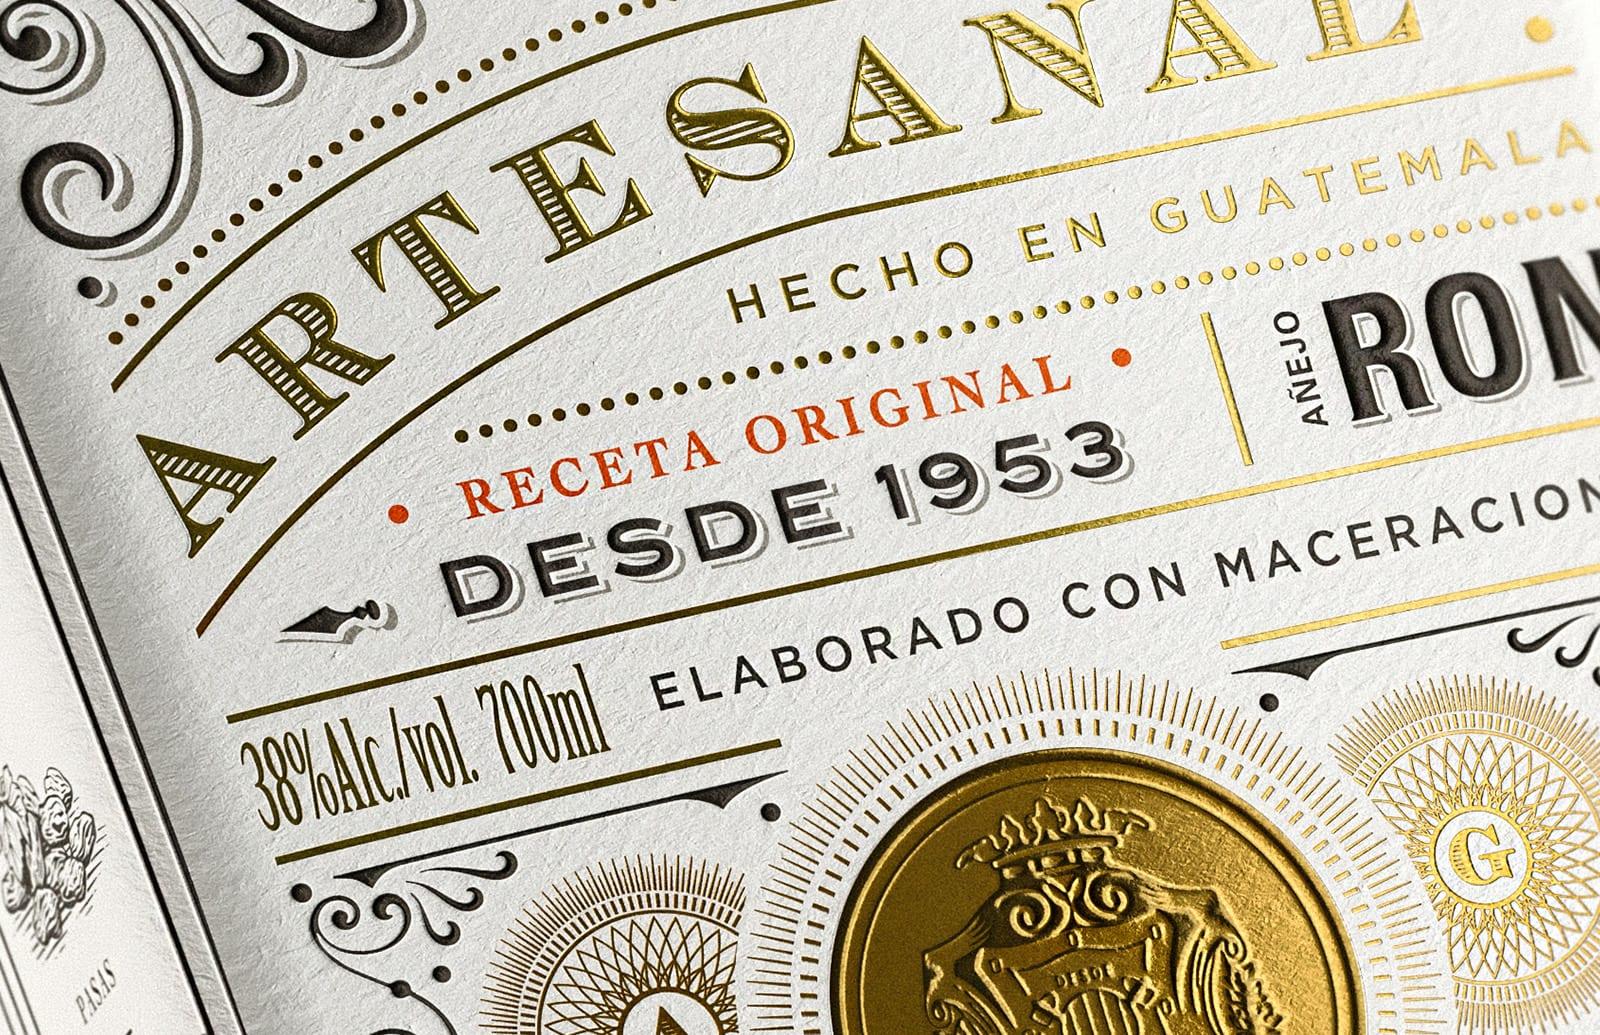 Colonial 5 - Nová vizuální identita rumu Ron Colonial